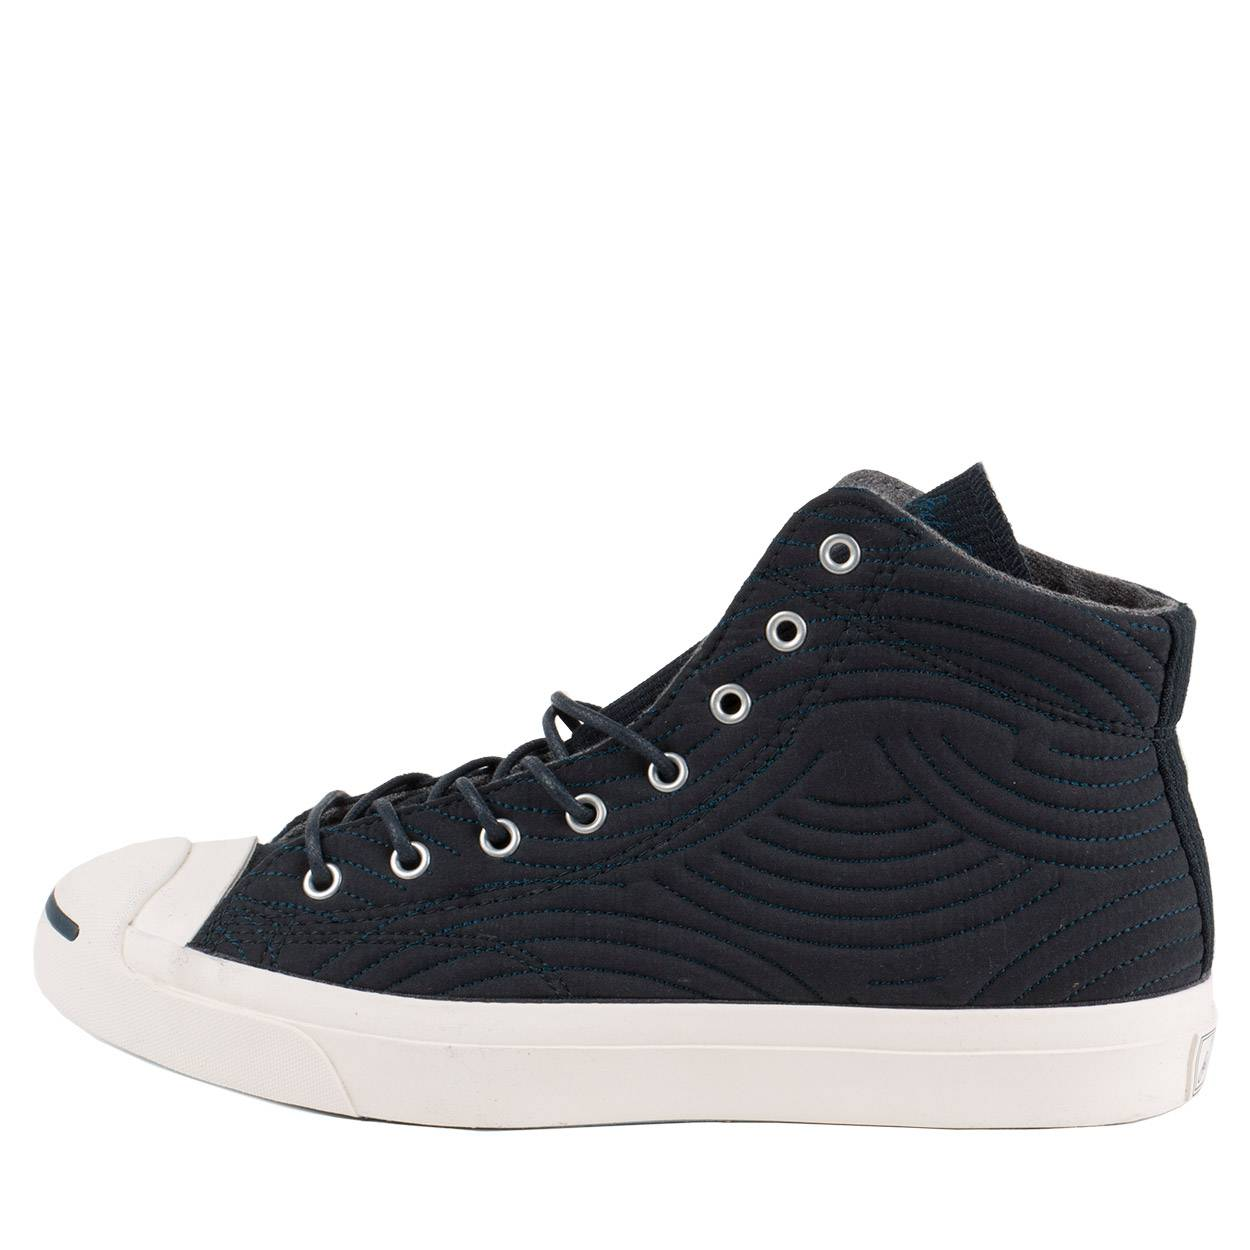 85f001a21d8 converse jack purcell amiral noir - Akileos